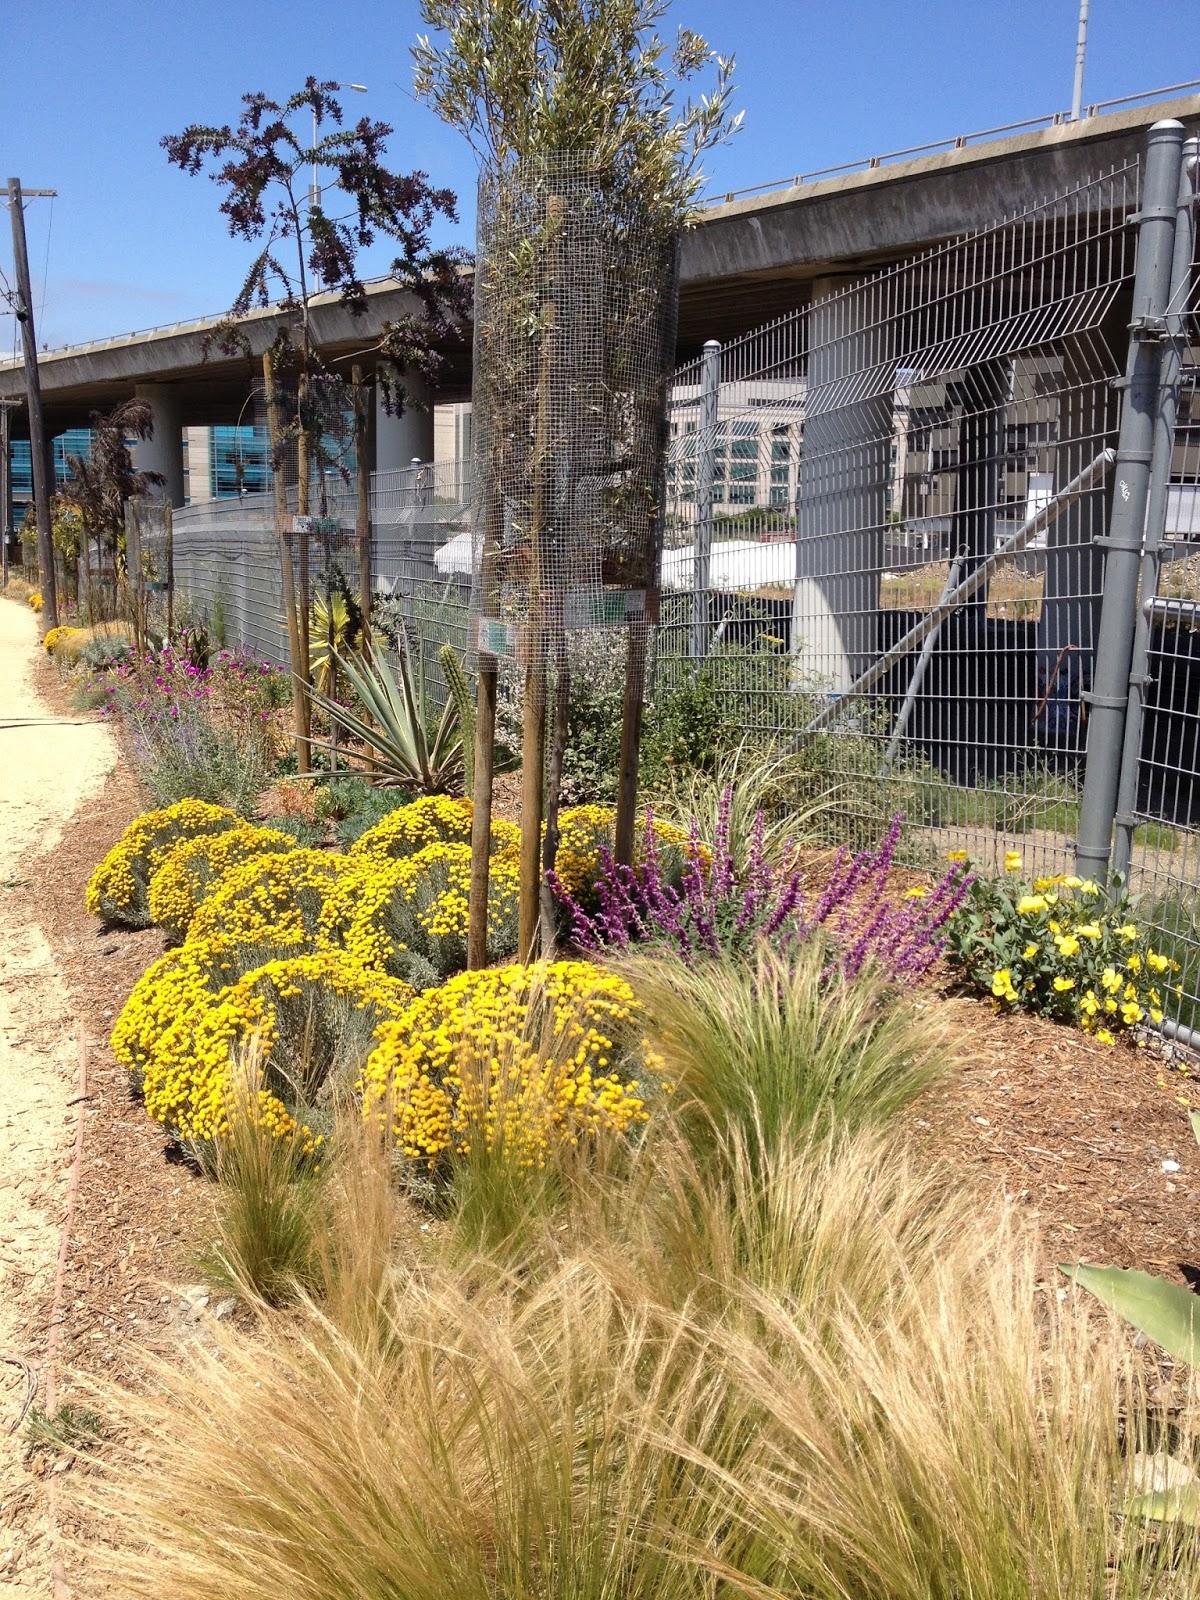 Incroyable Pennsylvania Garden Is Located At 251 Pennsylvania Avenue At 18th Street In  The Potrero Hill Neighborhood Of San Francisco, California.